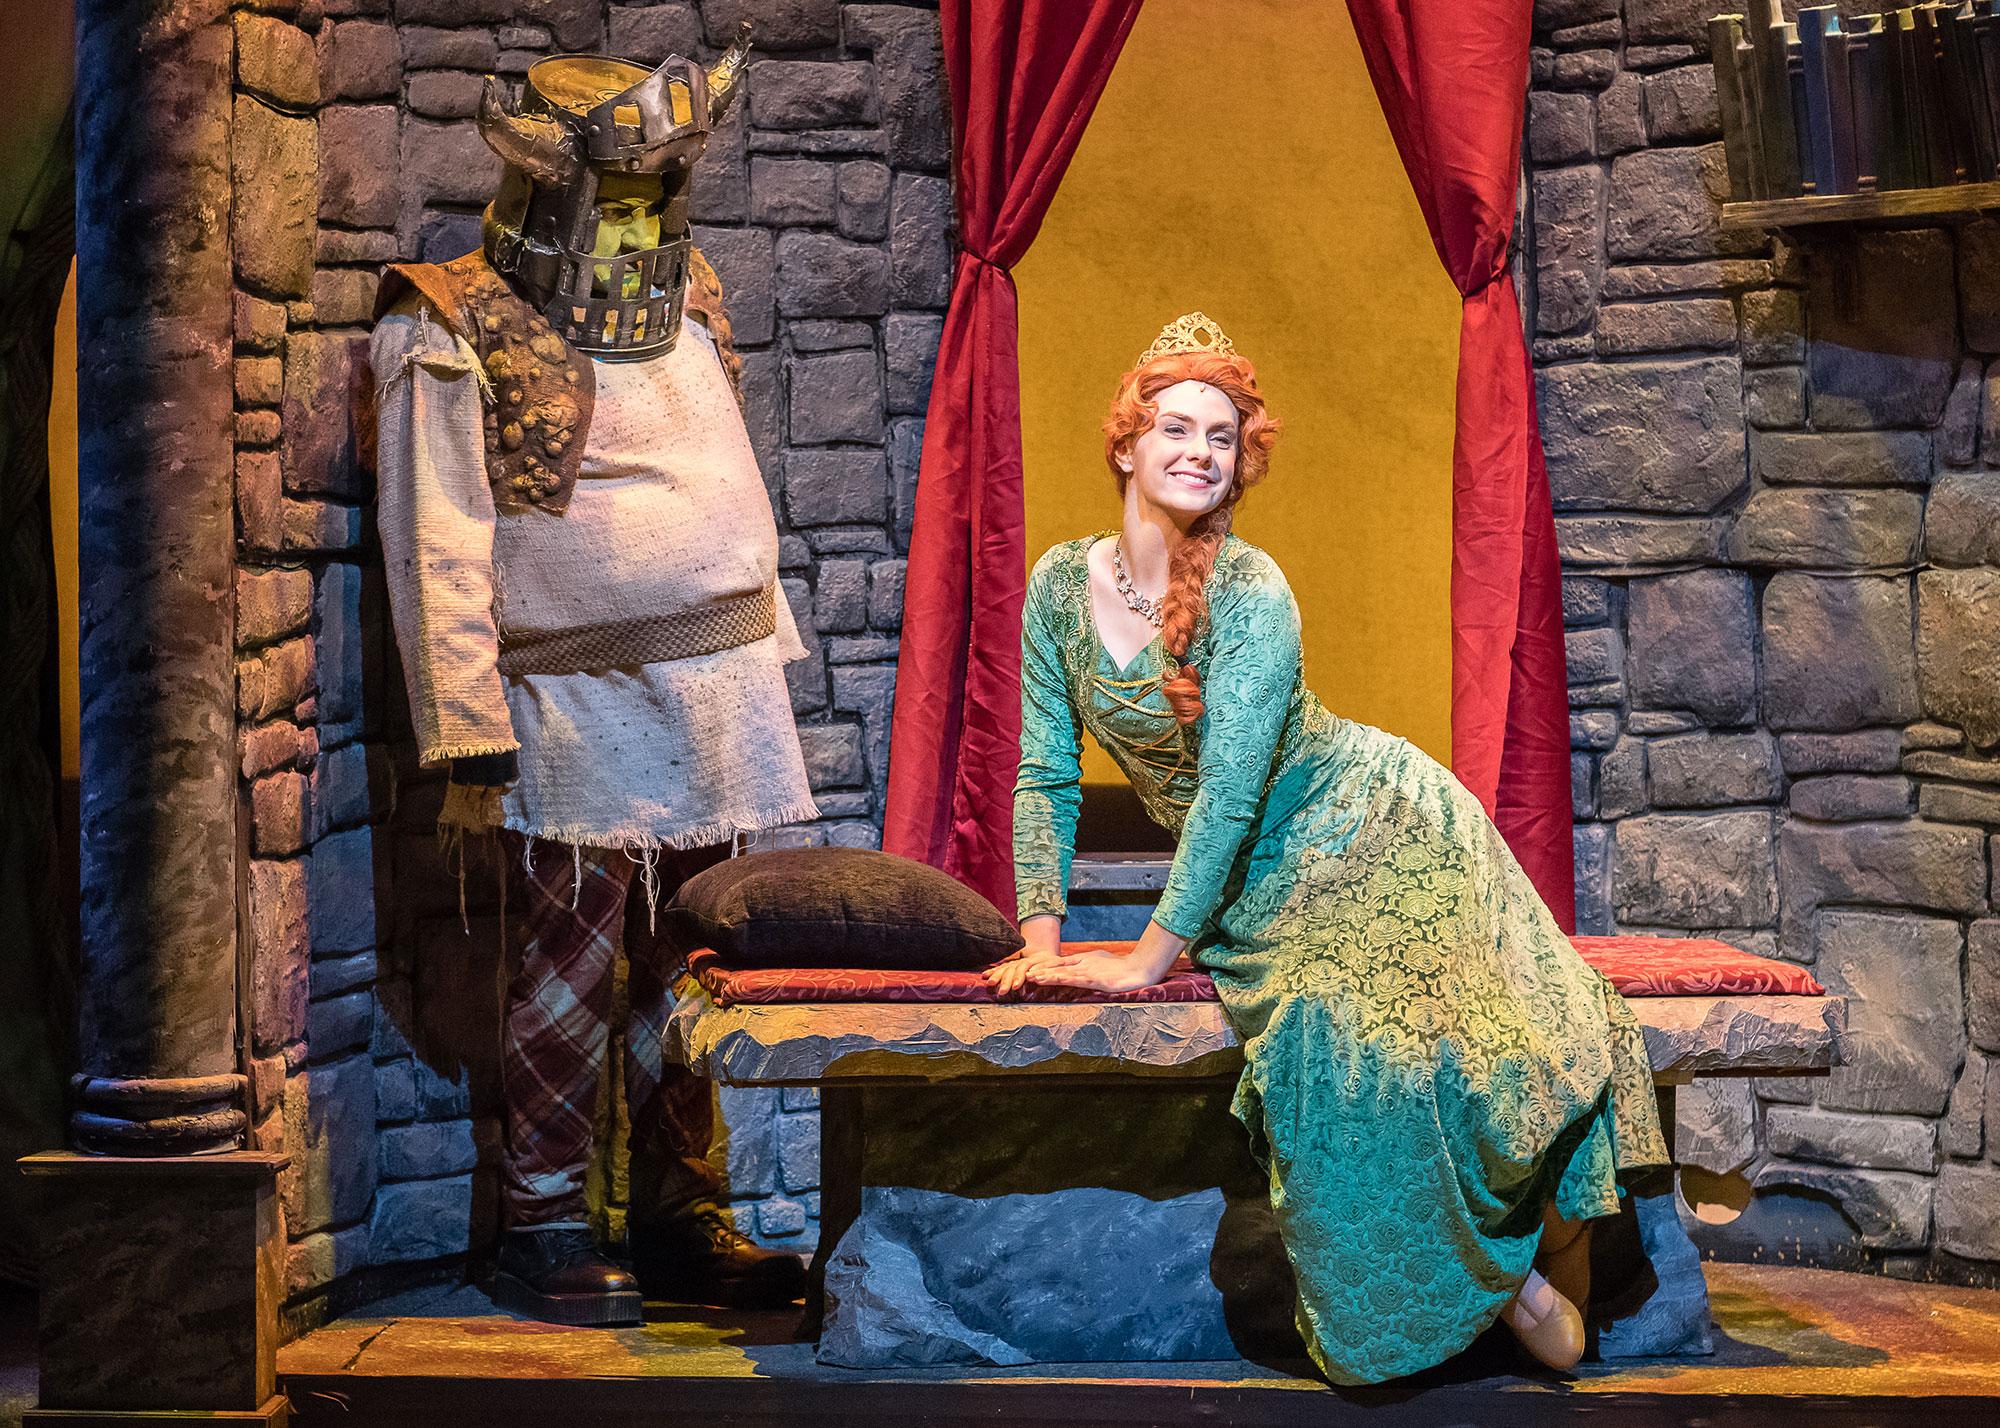 Gilgamesh-Taggett-(Shrek)-and-Natalie-Steen-(Fiona),-Photo-Credit-Andy-Dudik.jpg